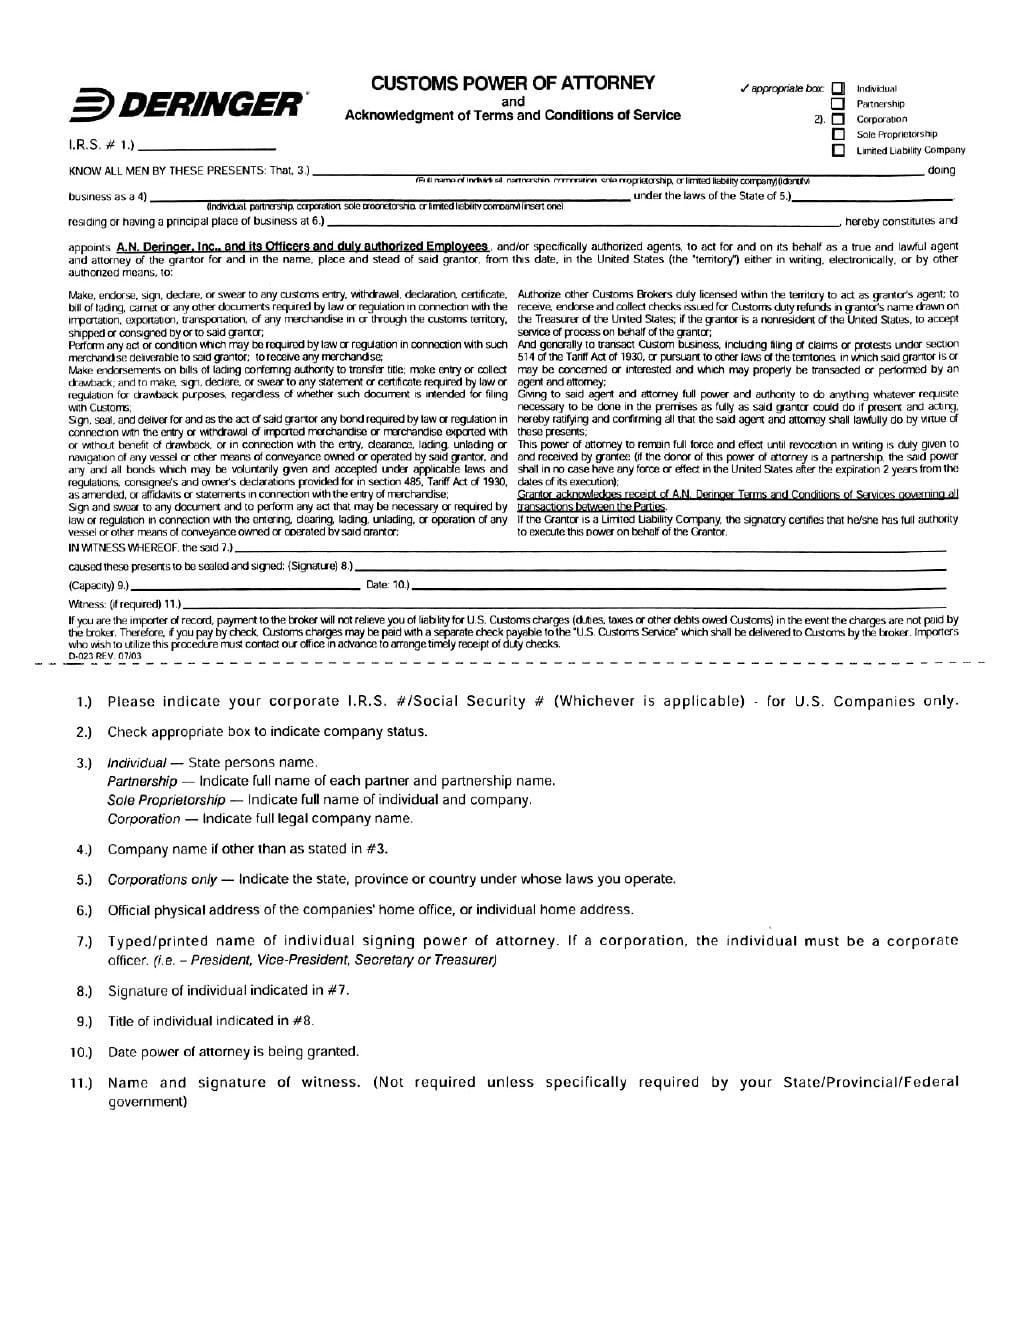 Free Deringer Customs Power Of Attorney Form